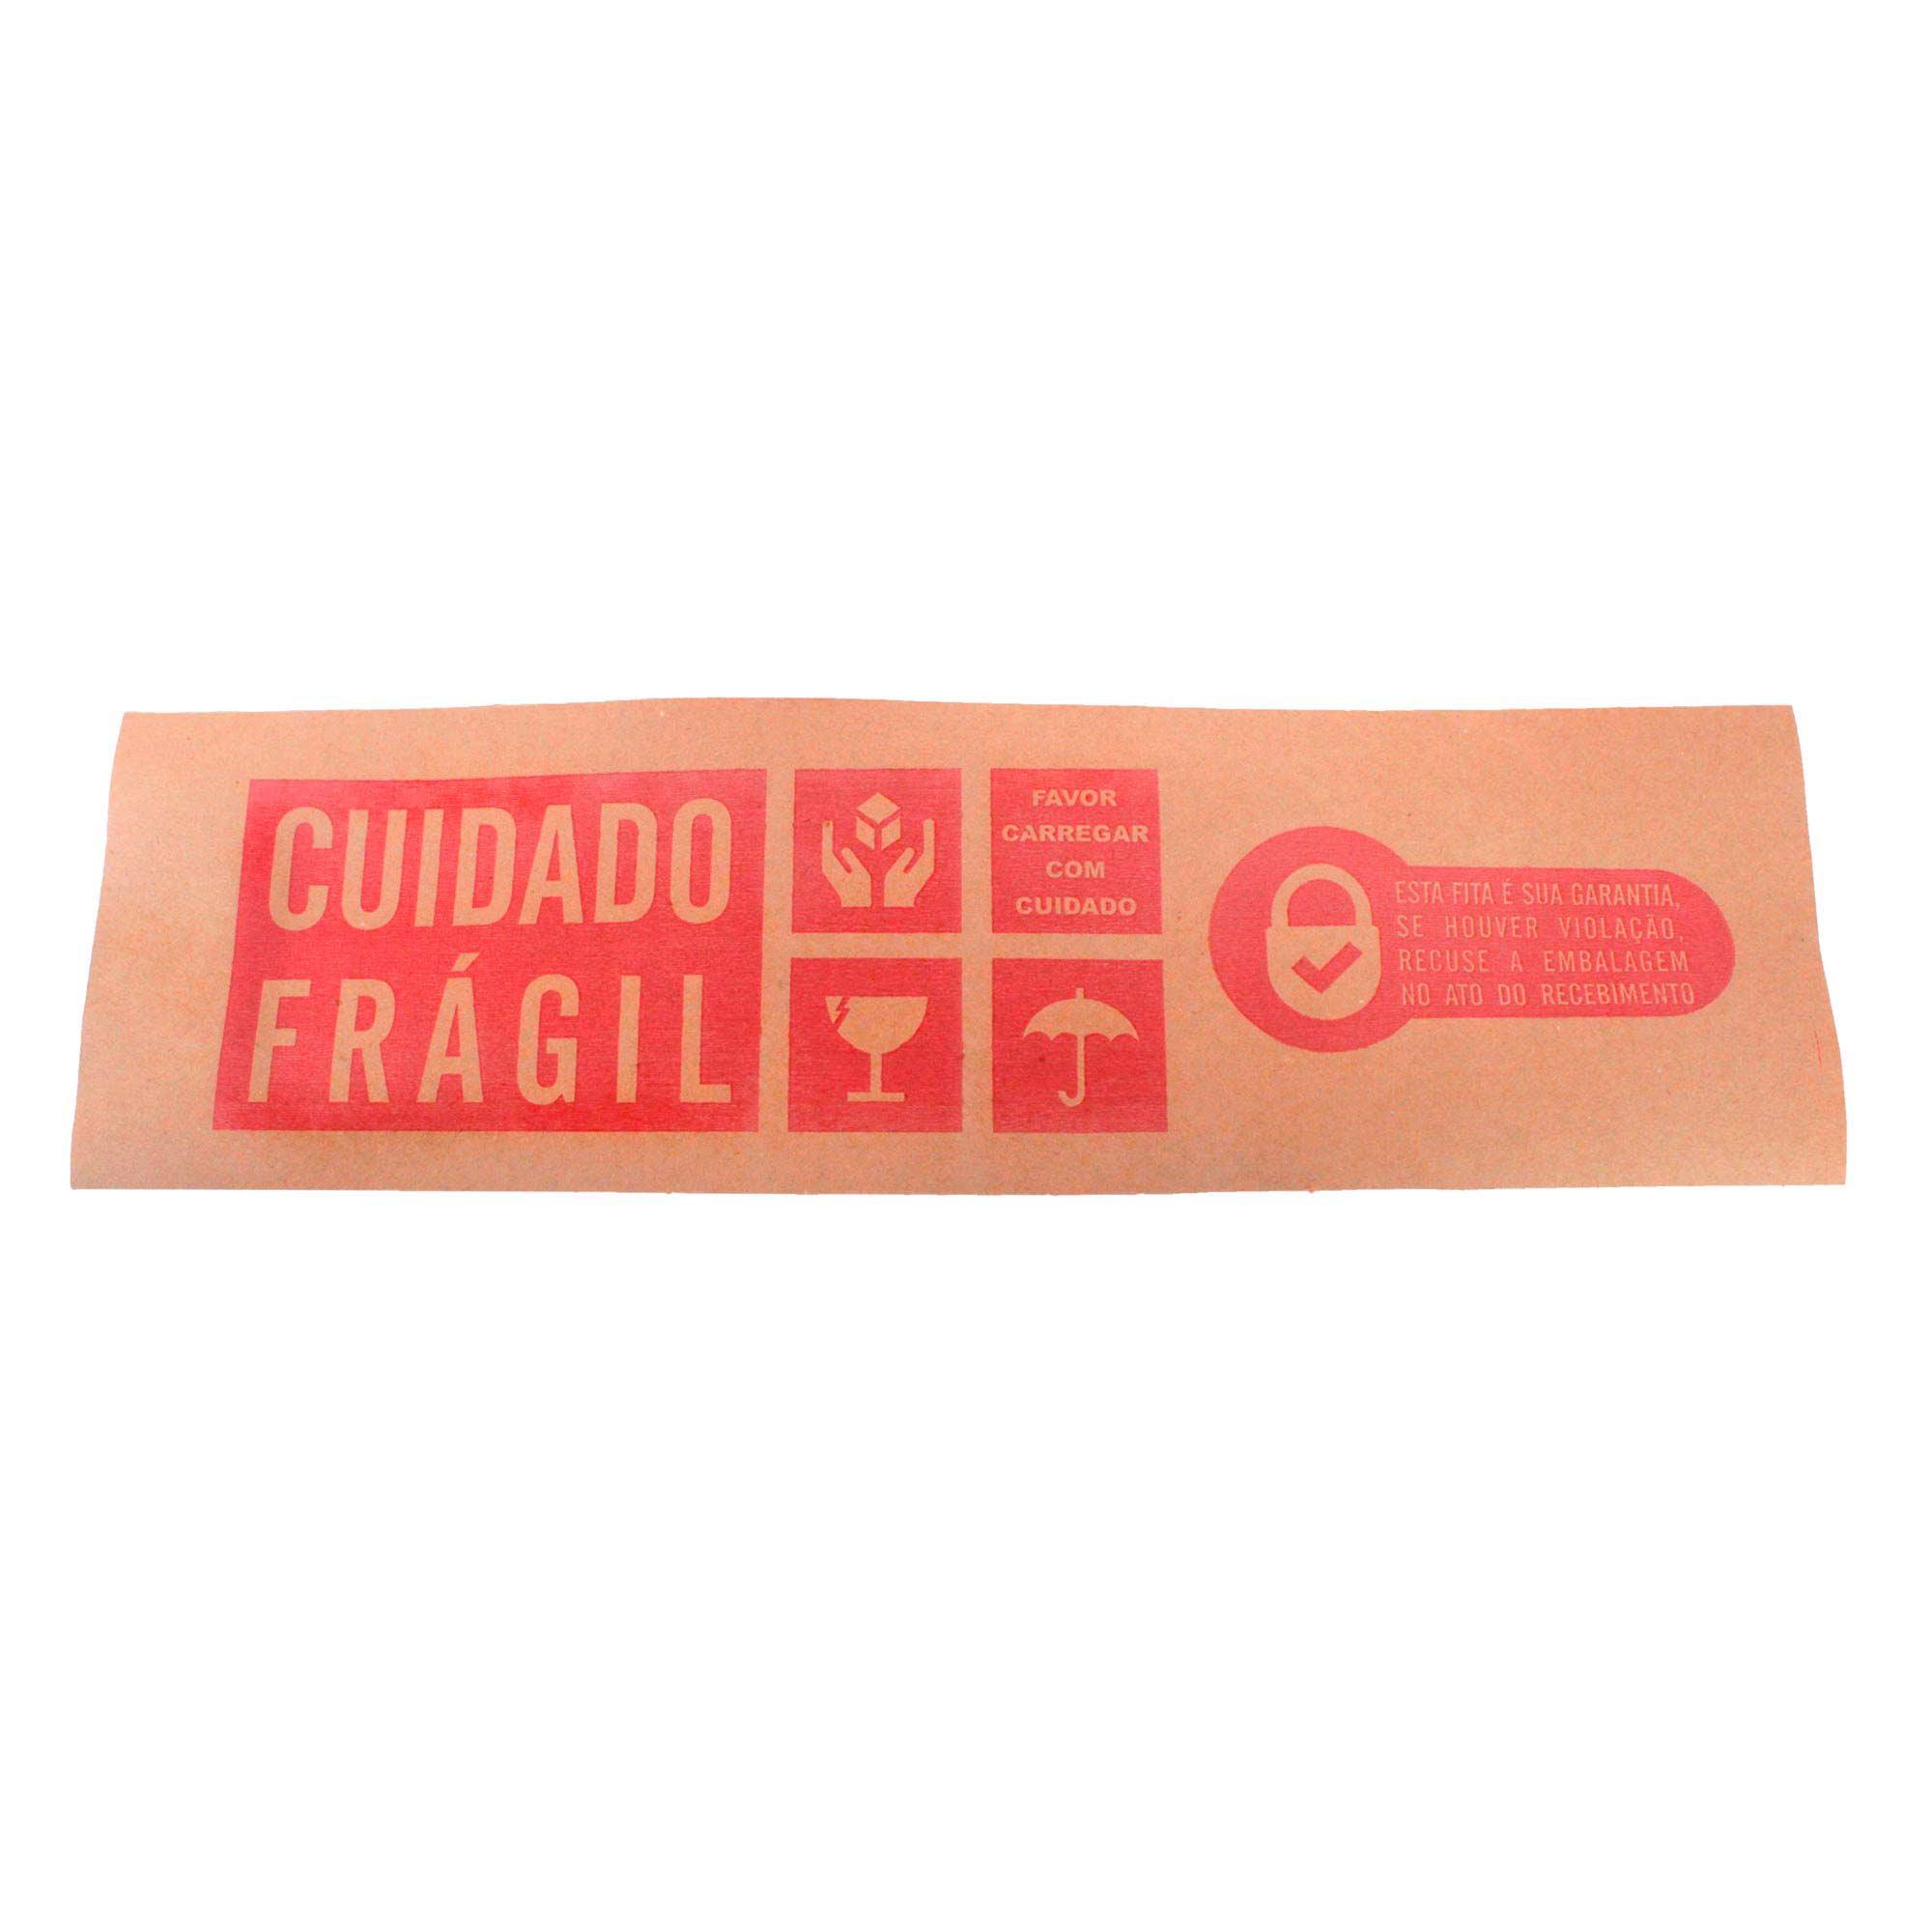 Fita Gomada Cuidado Frágil 80mm c/ Reforço 1,5 kg Supplypack